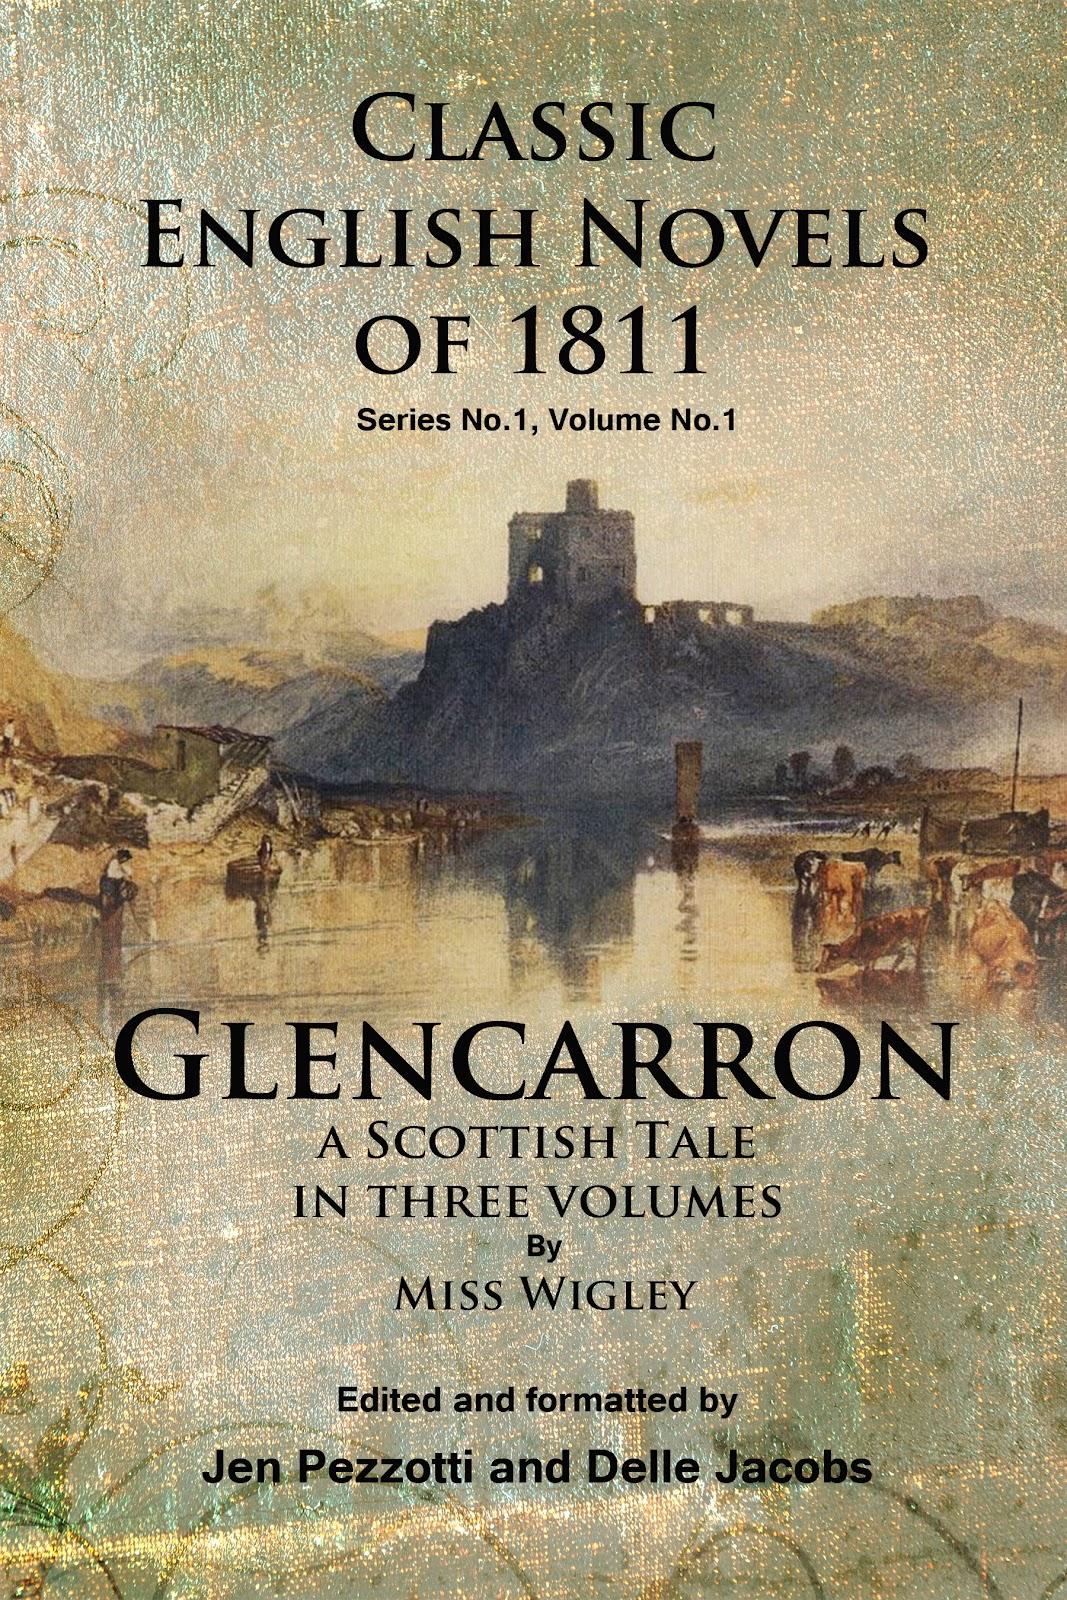 ePubble: Classic English Novel Series